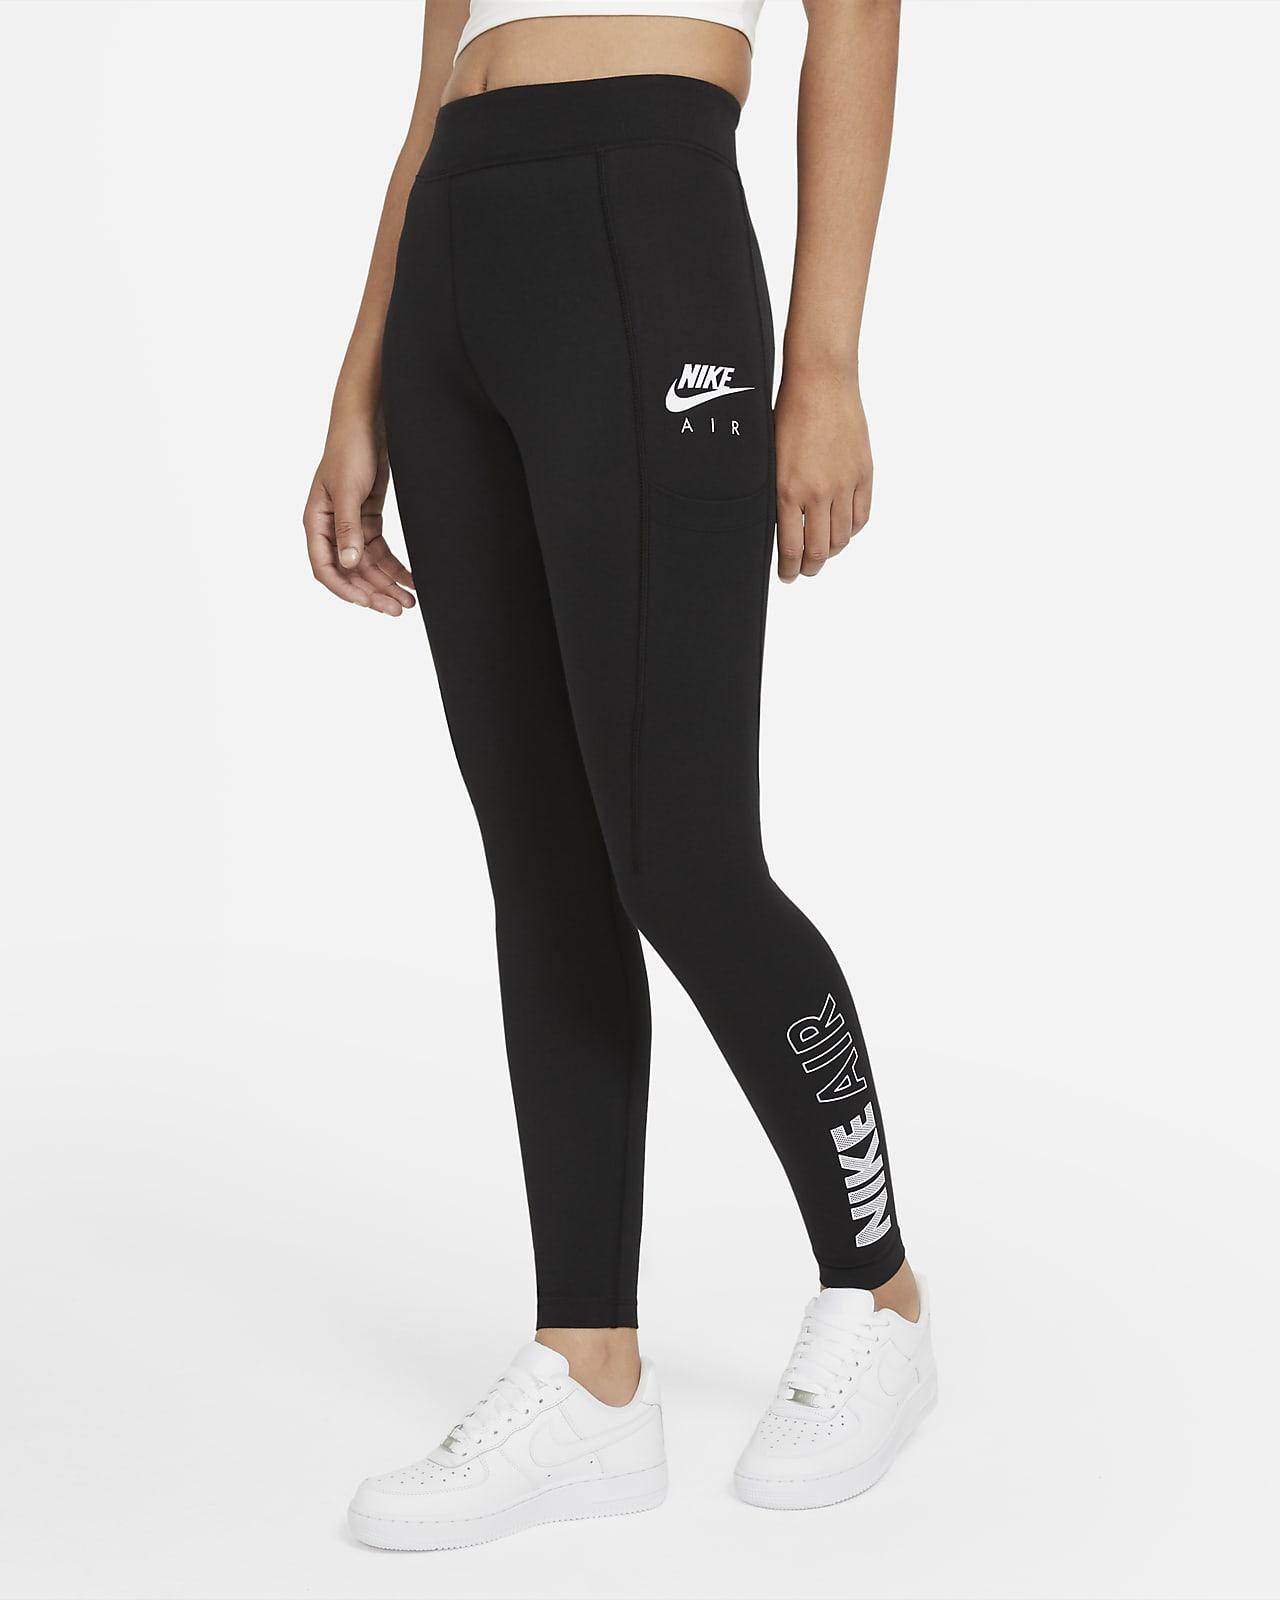 Collant taille haute Nike Air pour Femme